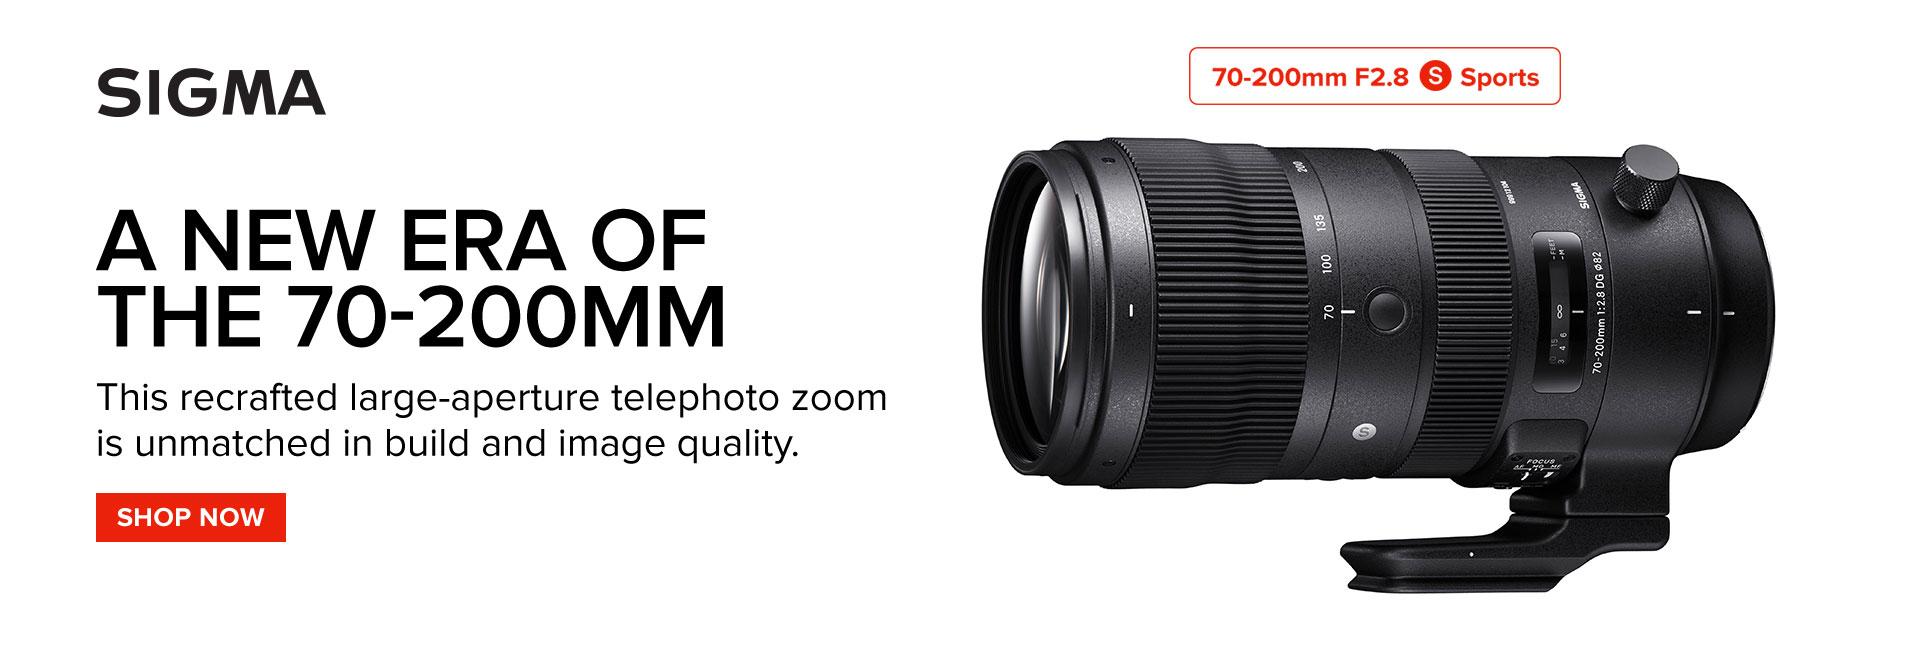 sigma 70-200mm lens